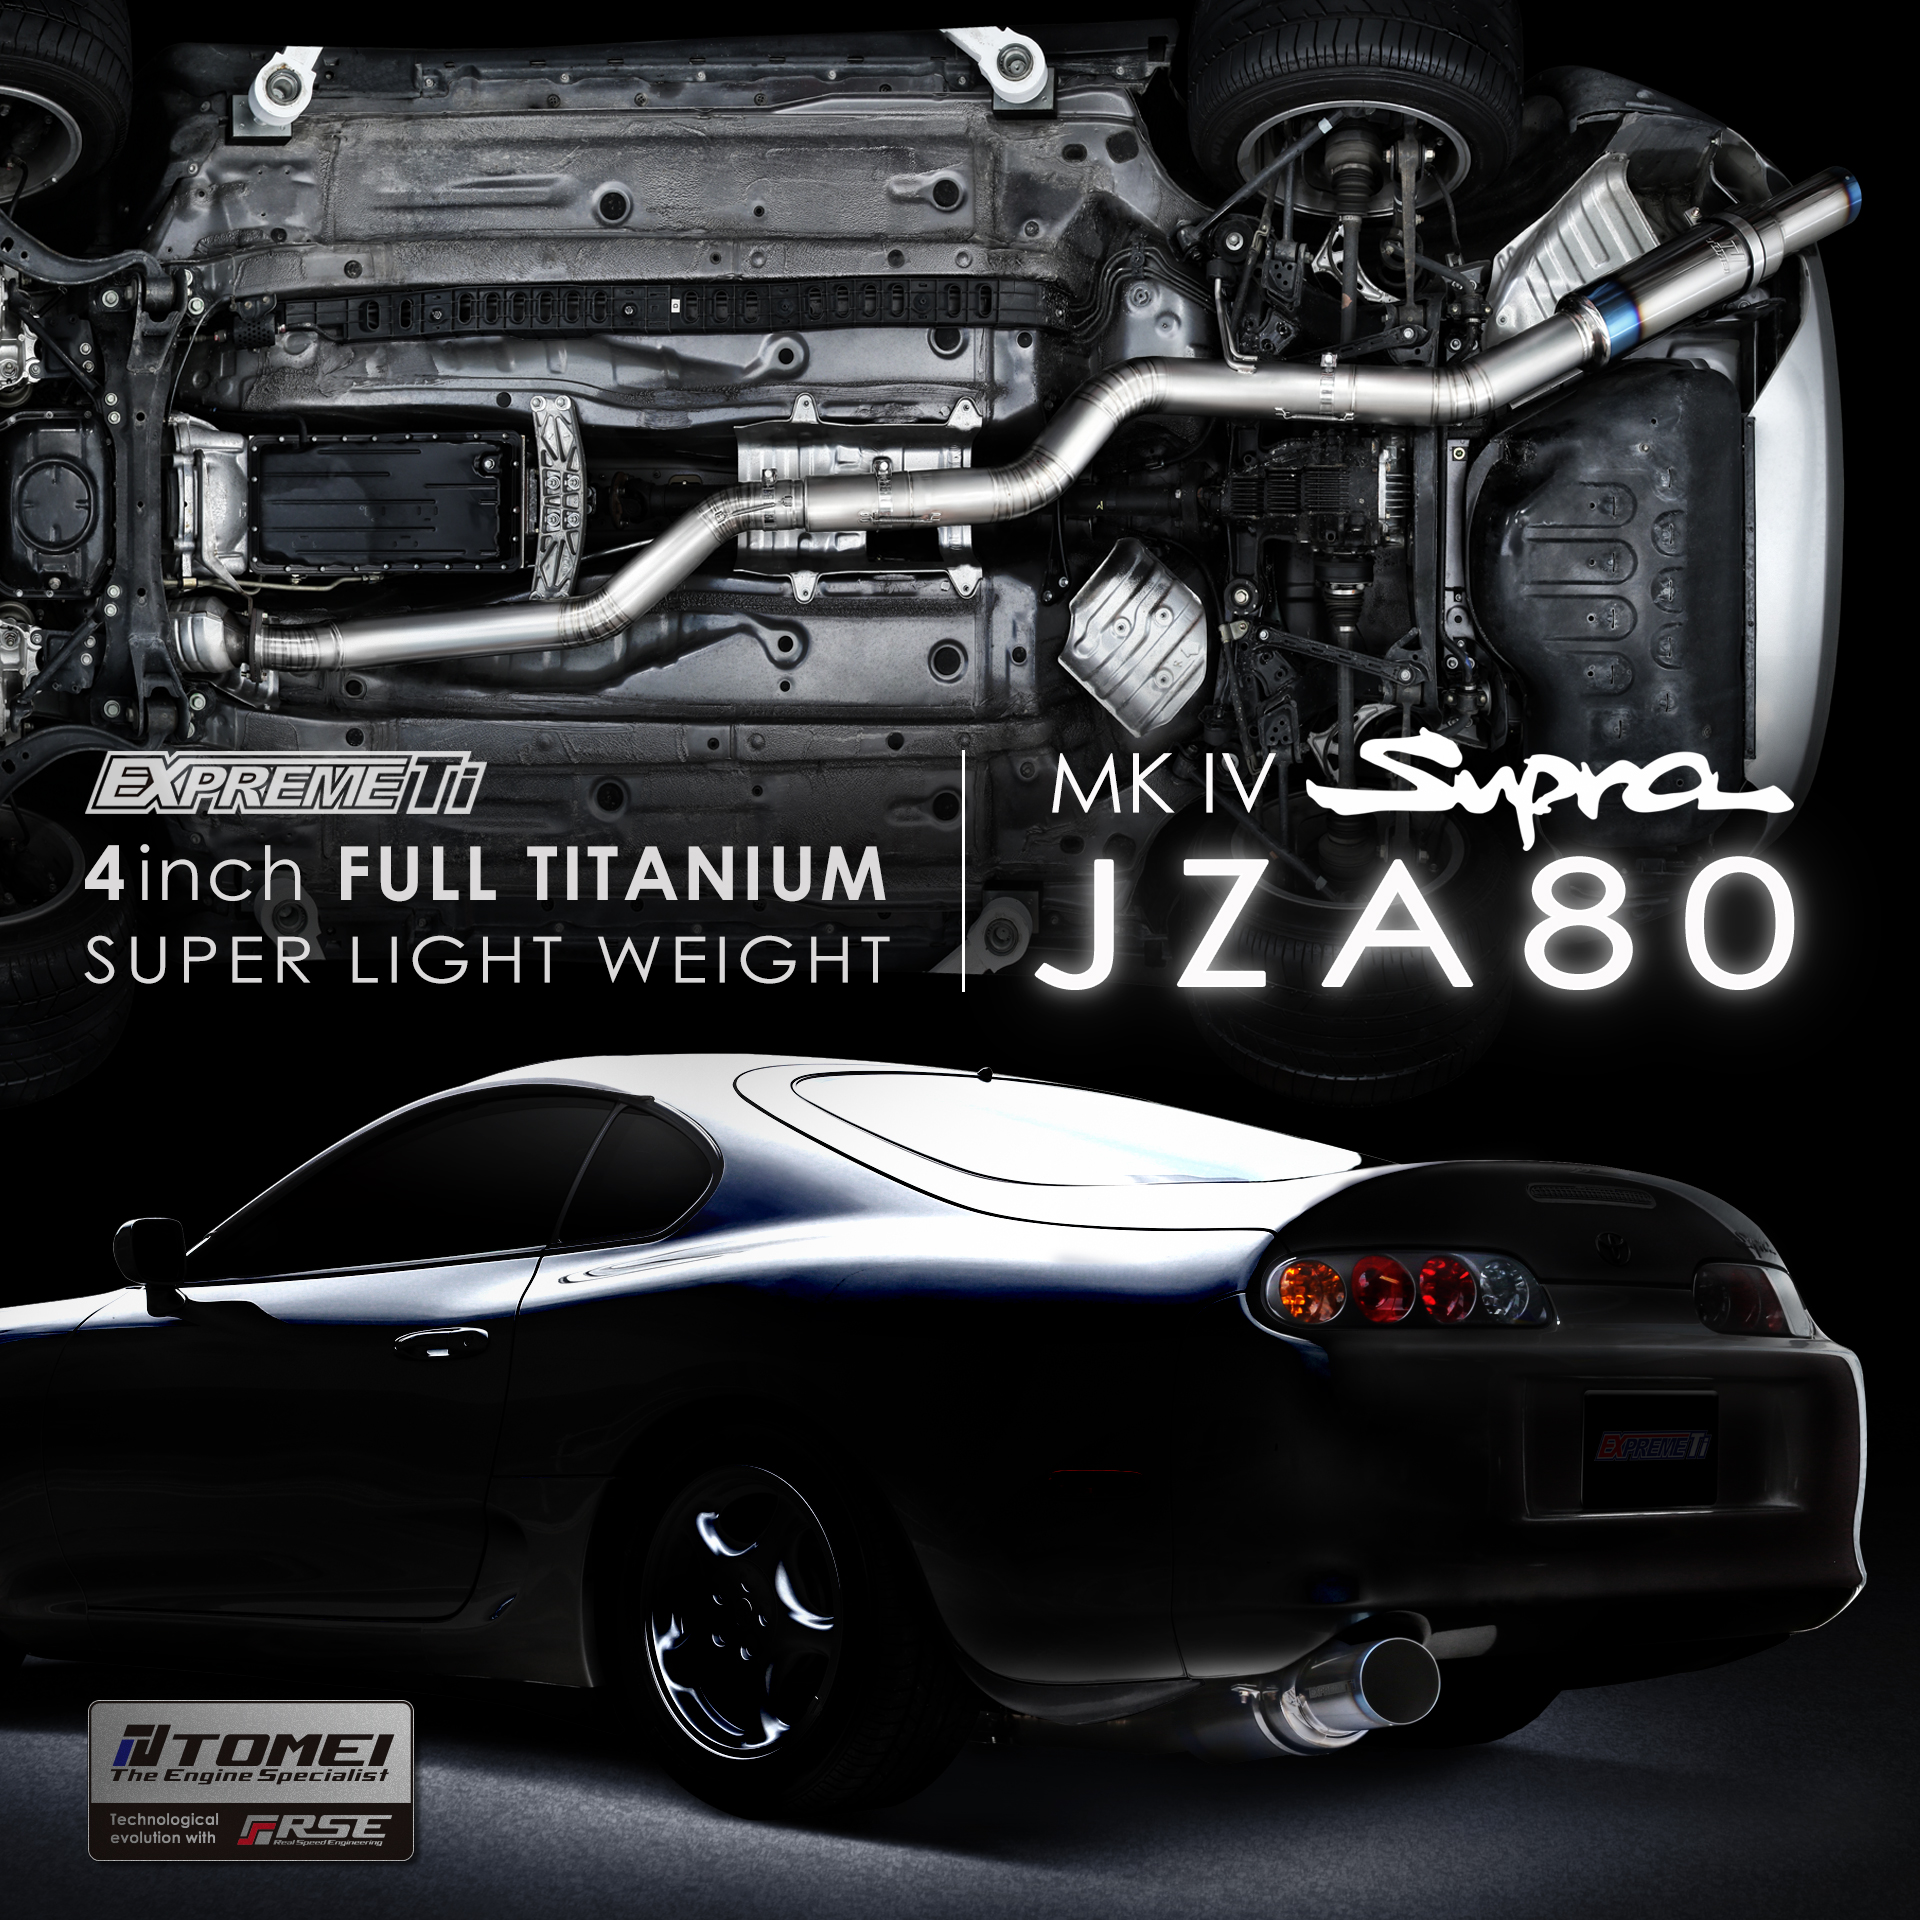 4inch  FULL TITANIUM MUFFLER  -MK IV SUPRA JZA80-